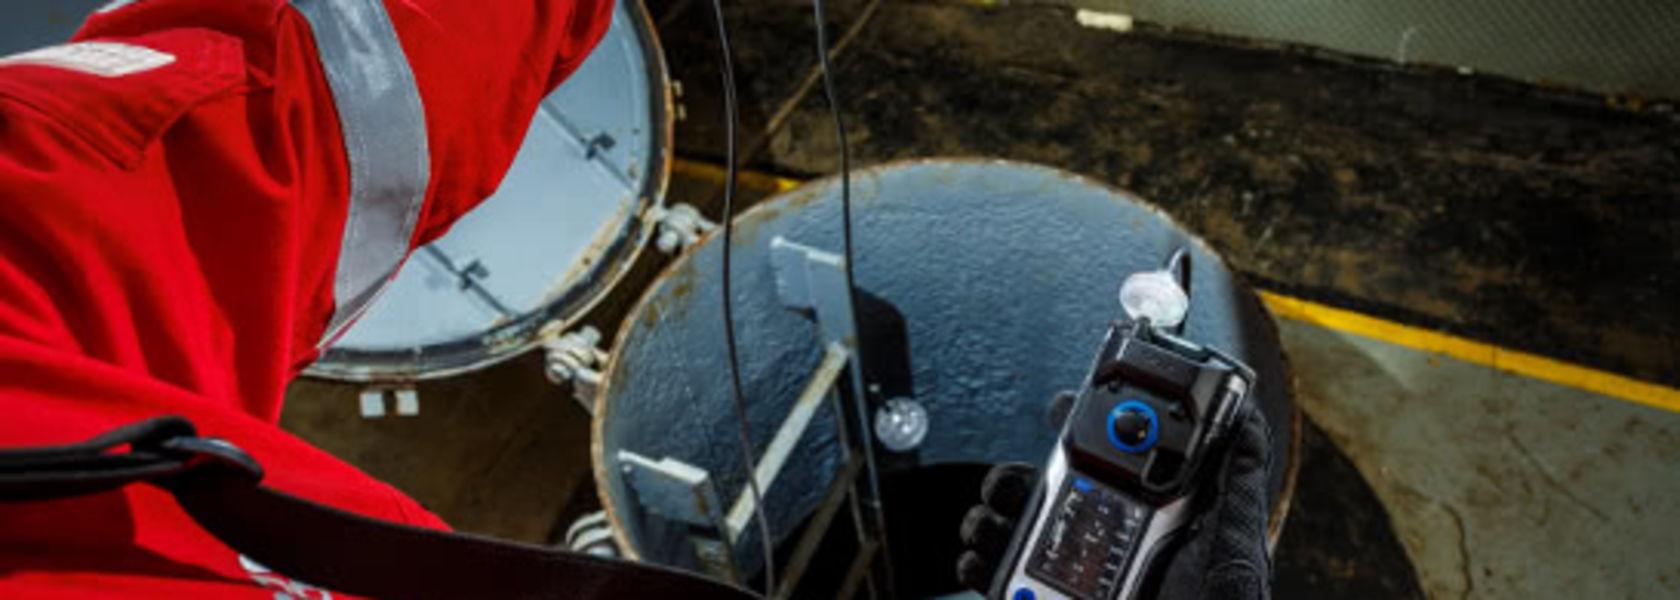 Dräger introduces seven-gas detector X-am 8000 - Mining Magazine